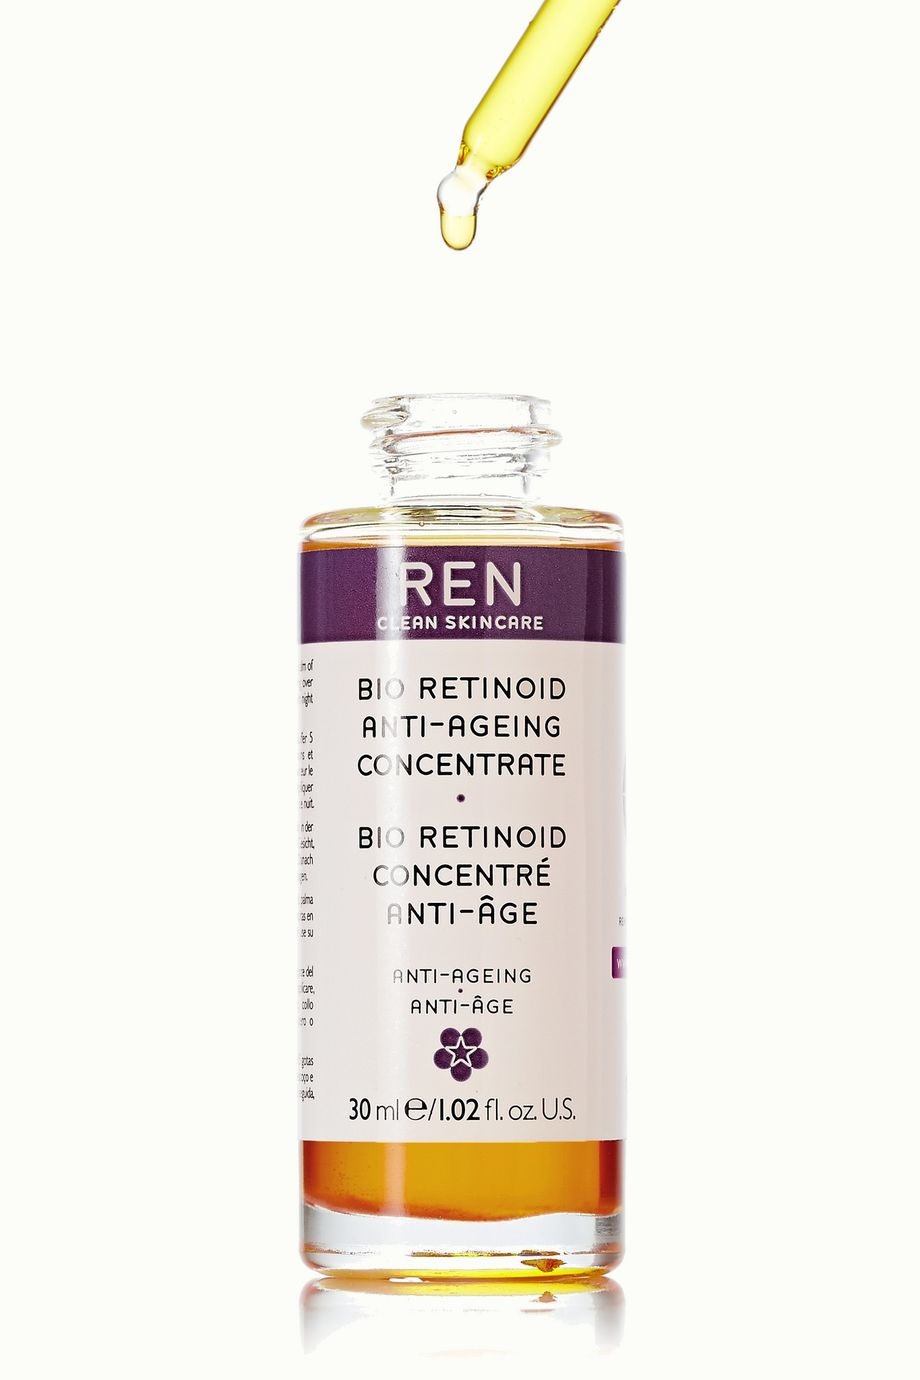 REN Clean Skincare Bio Retinoid Anti-Wrinkle Concentrate Oil, 30ml